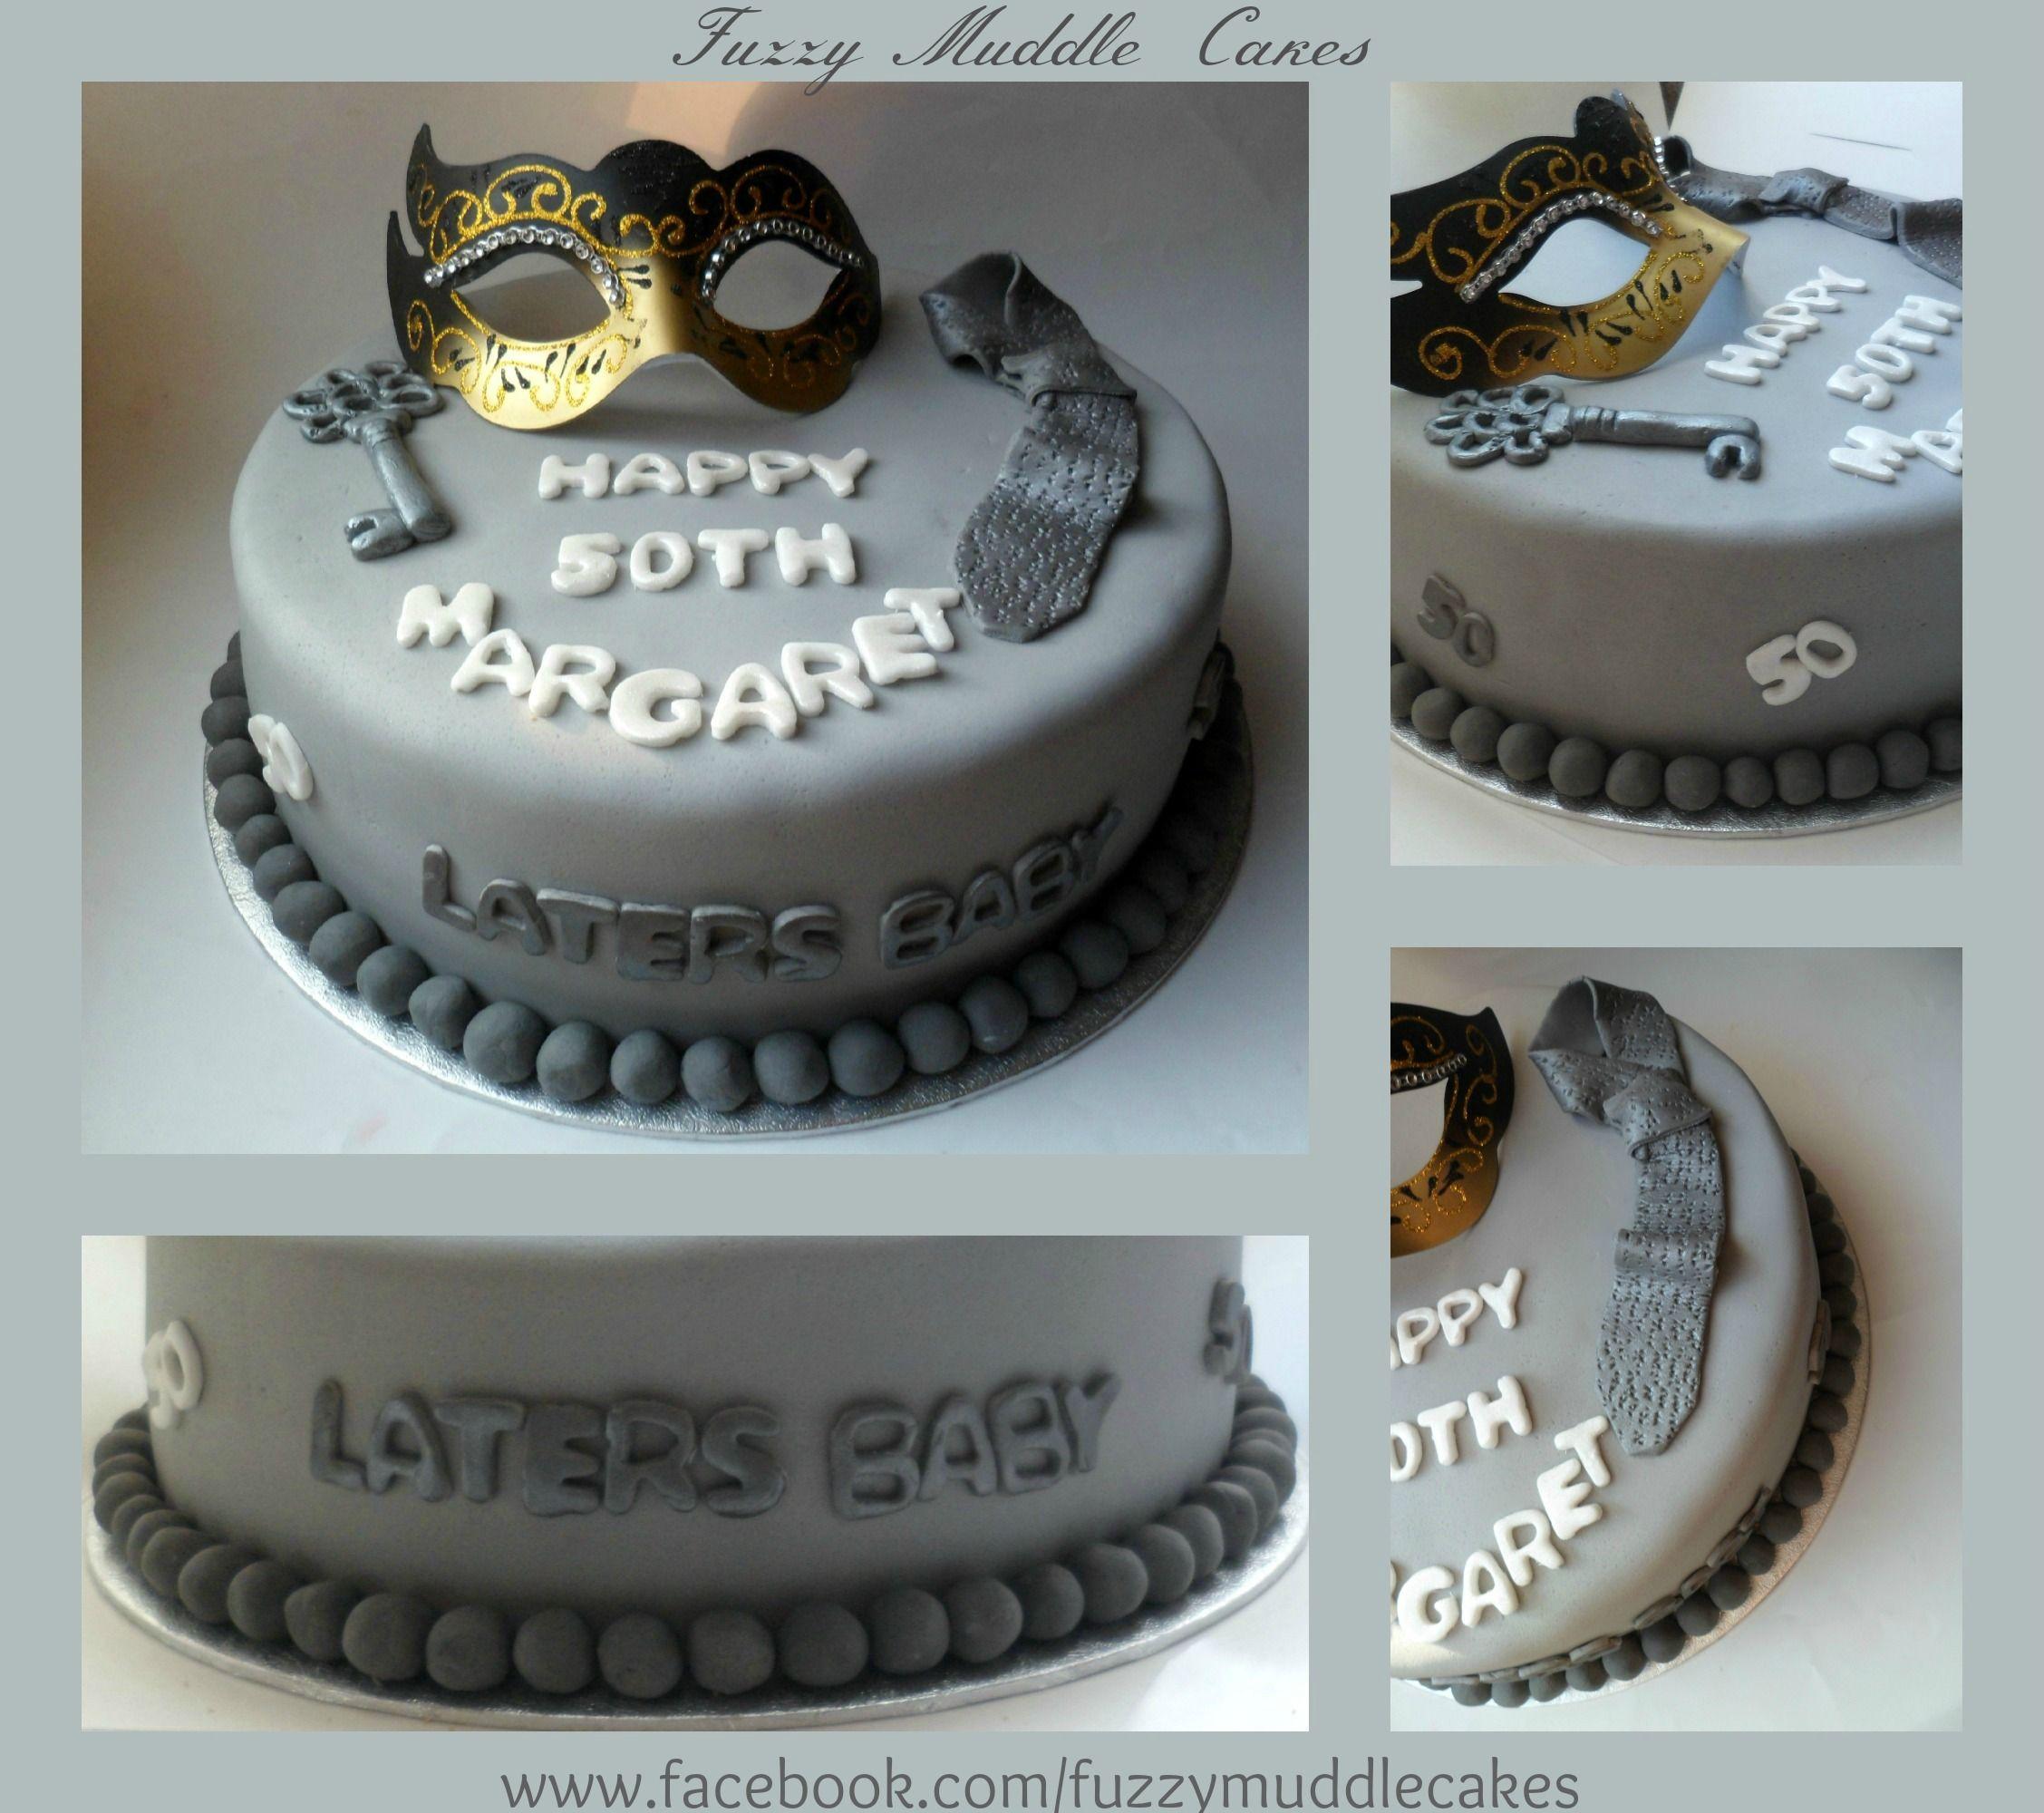 50 Shades Of Grey Decorations Fifty Shades Of Grey Birthday Cake Cake Ideas Pinterest